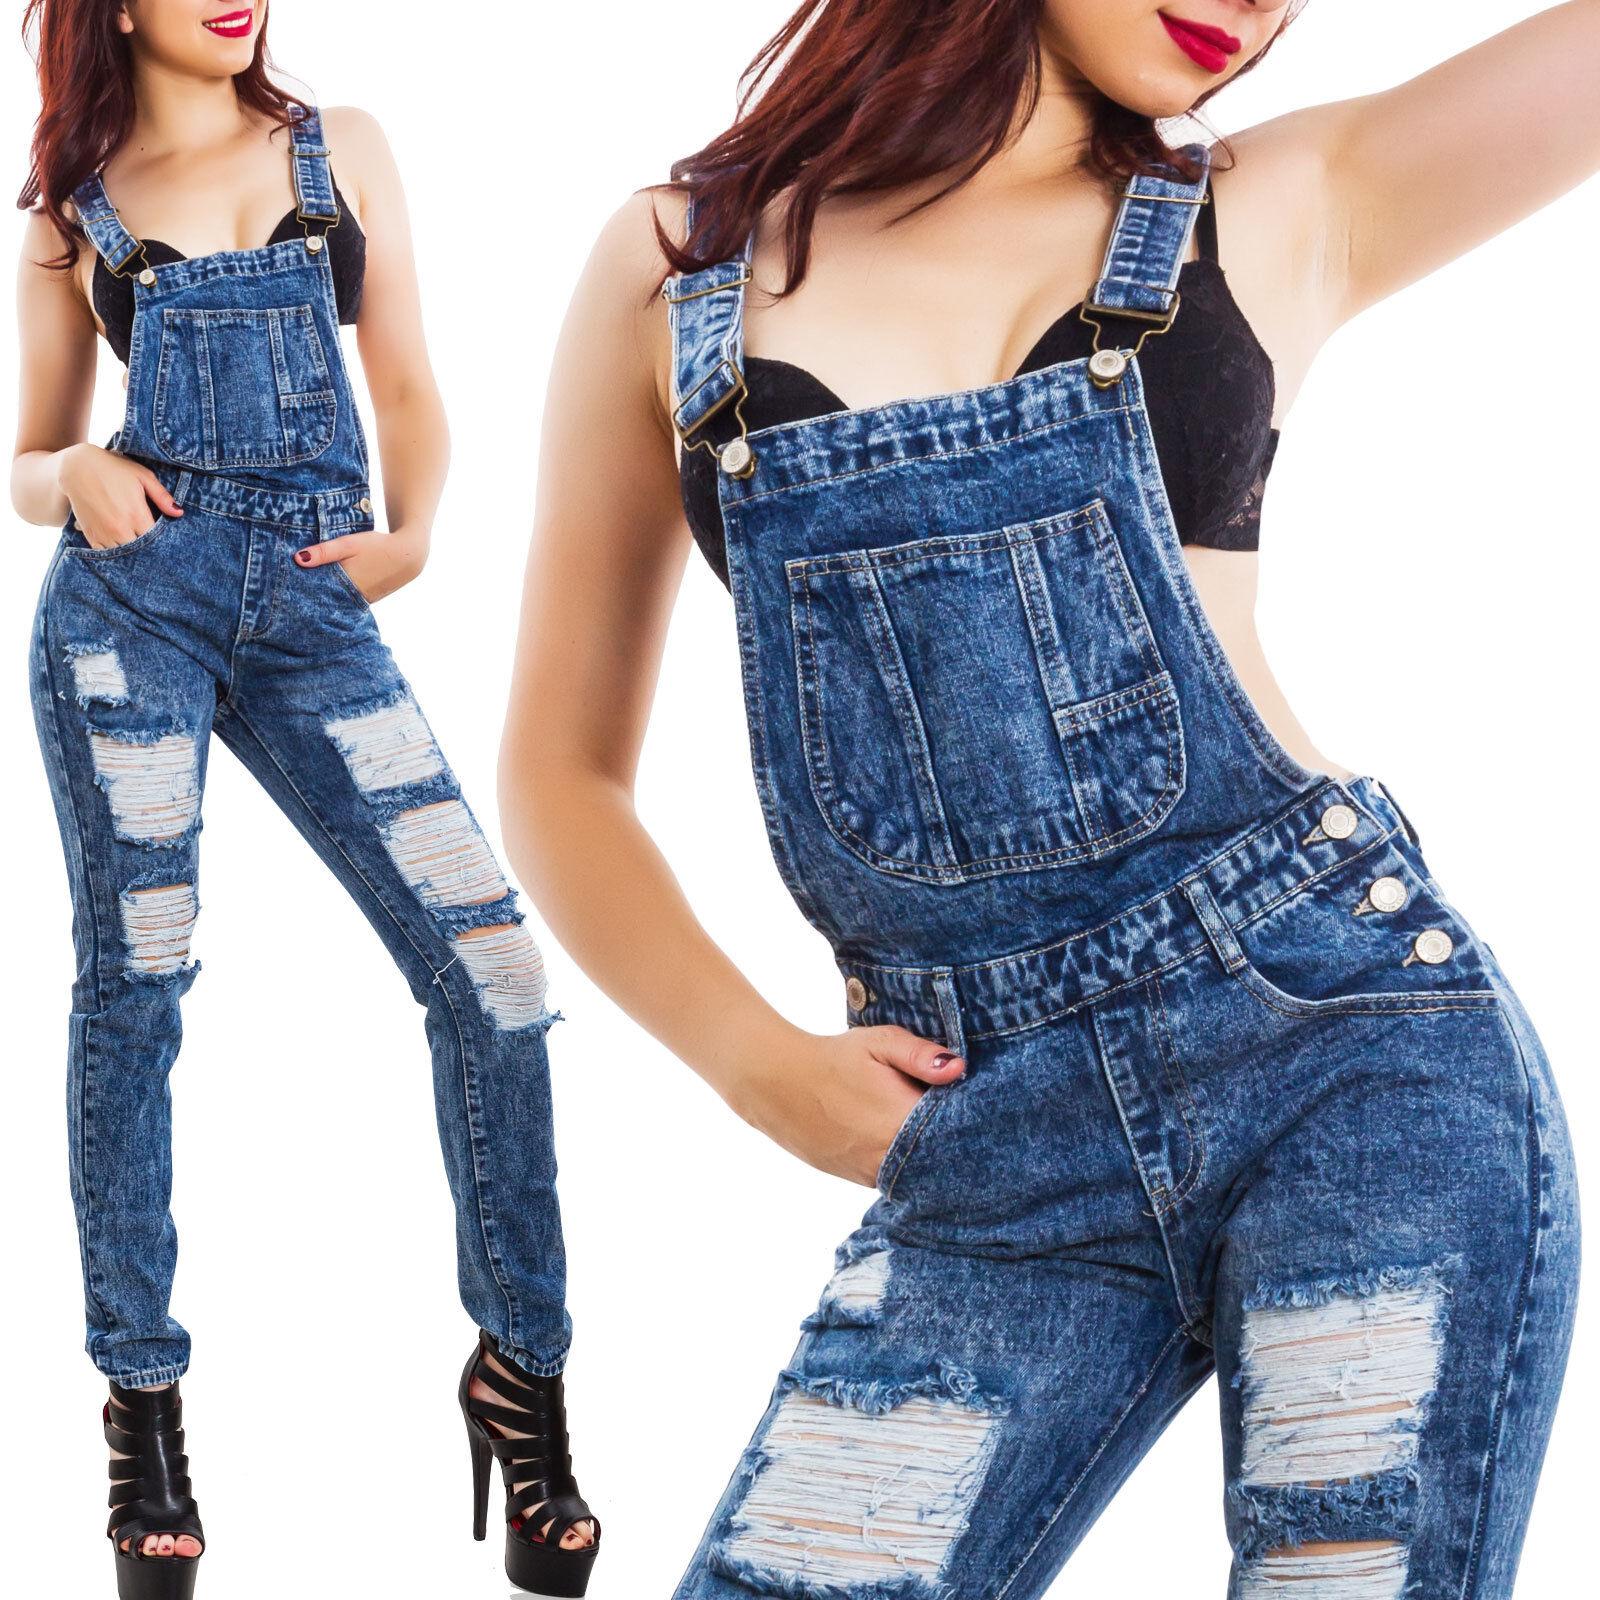 412d9daab049 Salopette donna jeans overall skinny tutina intera strappi tagli hot ...